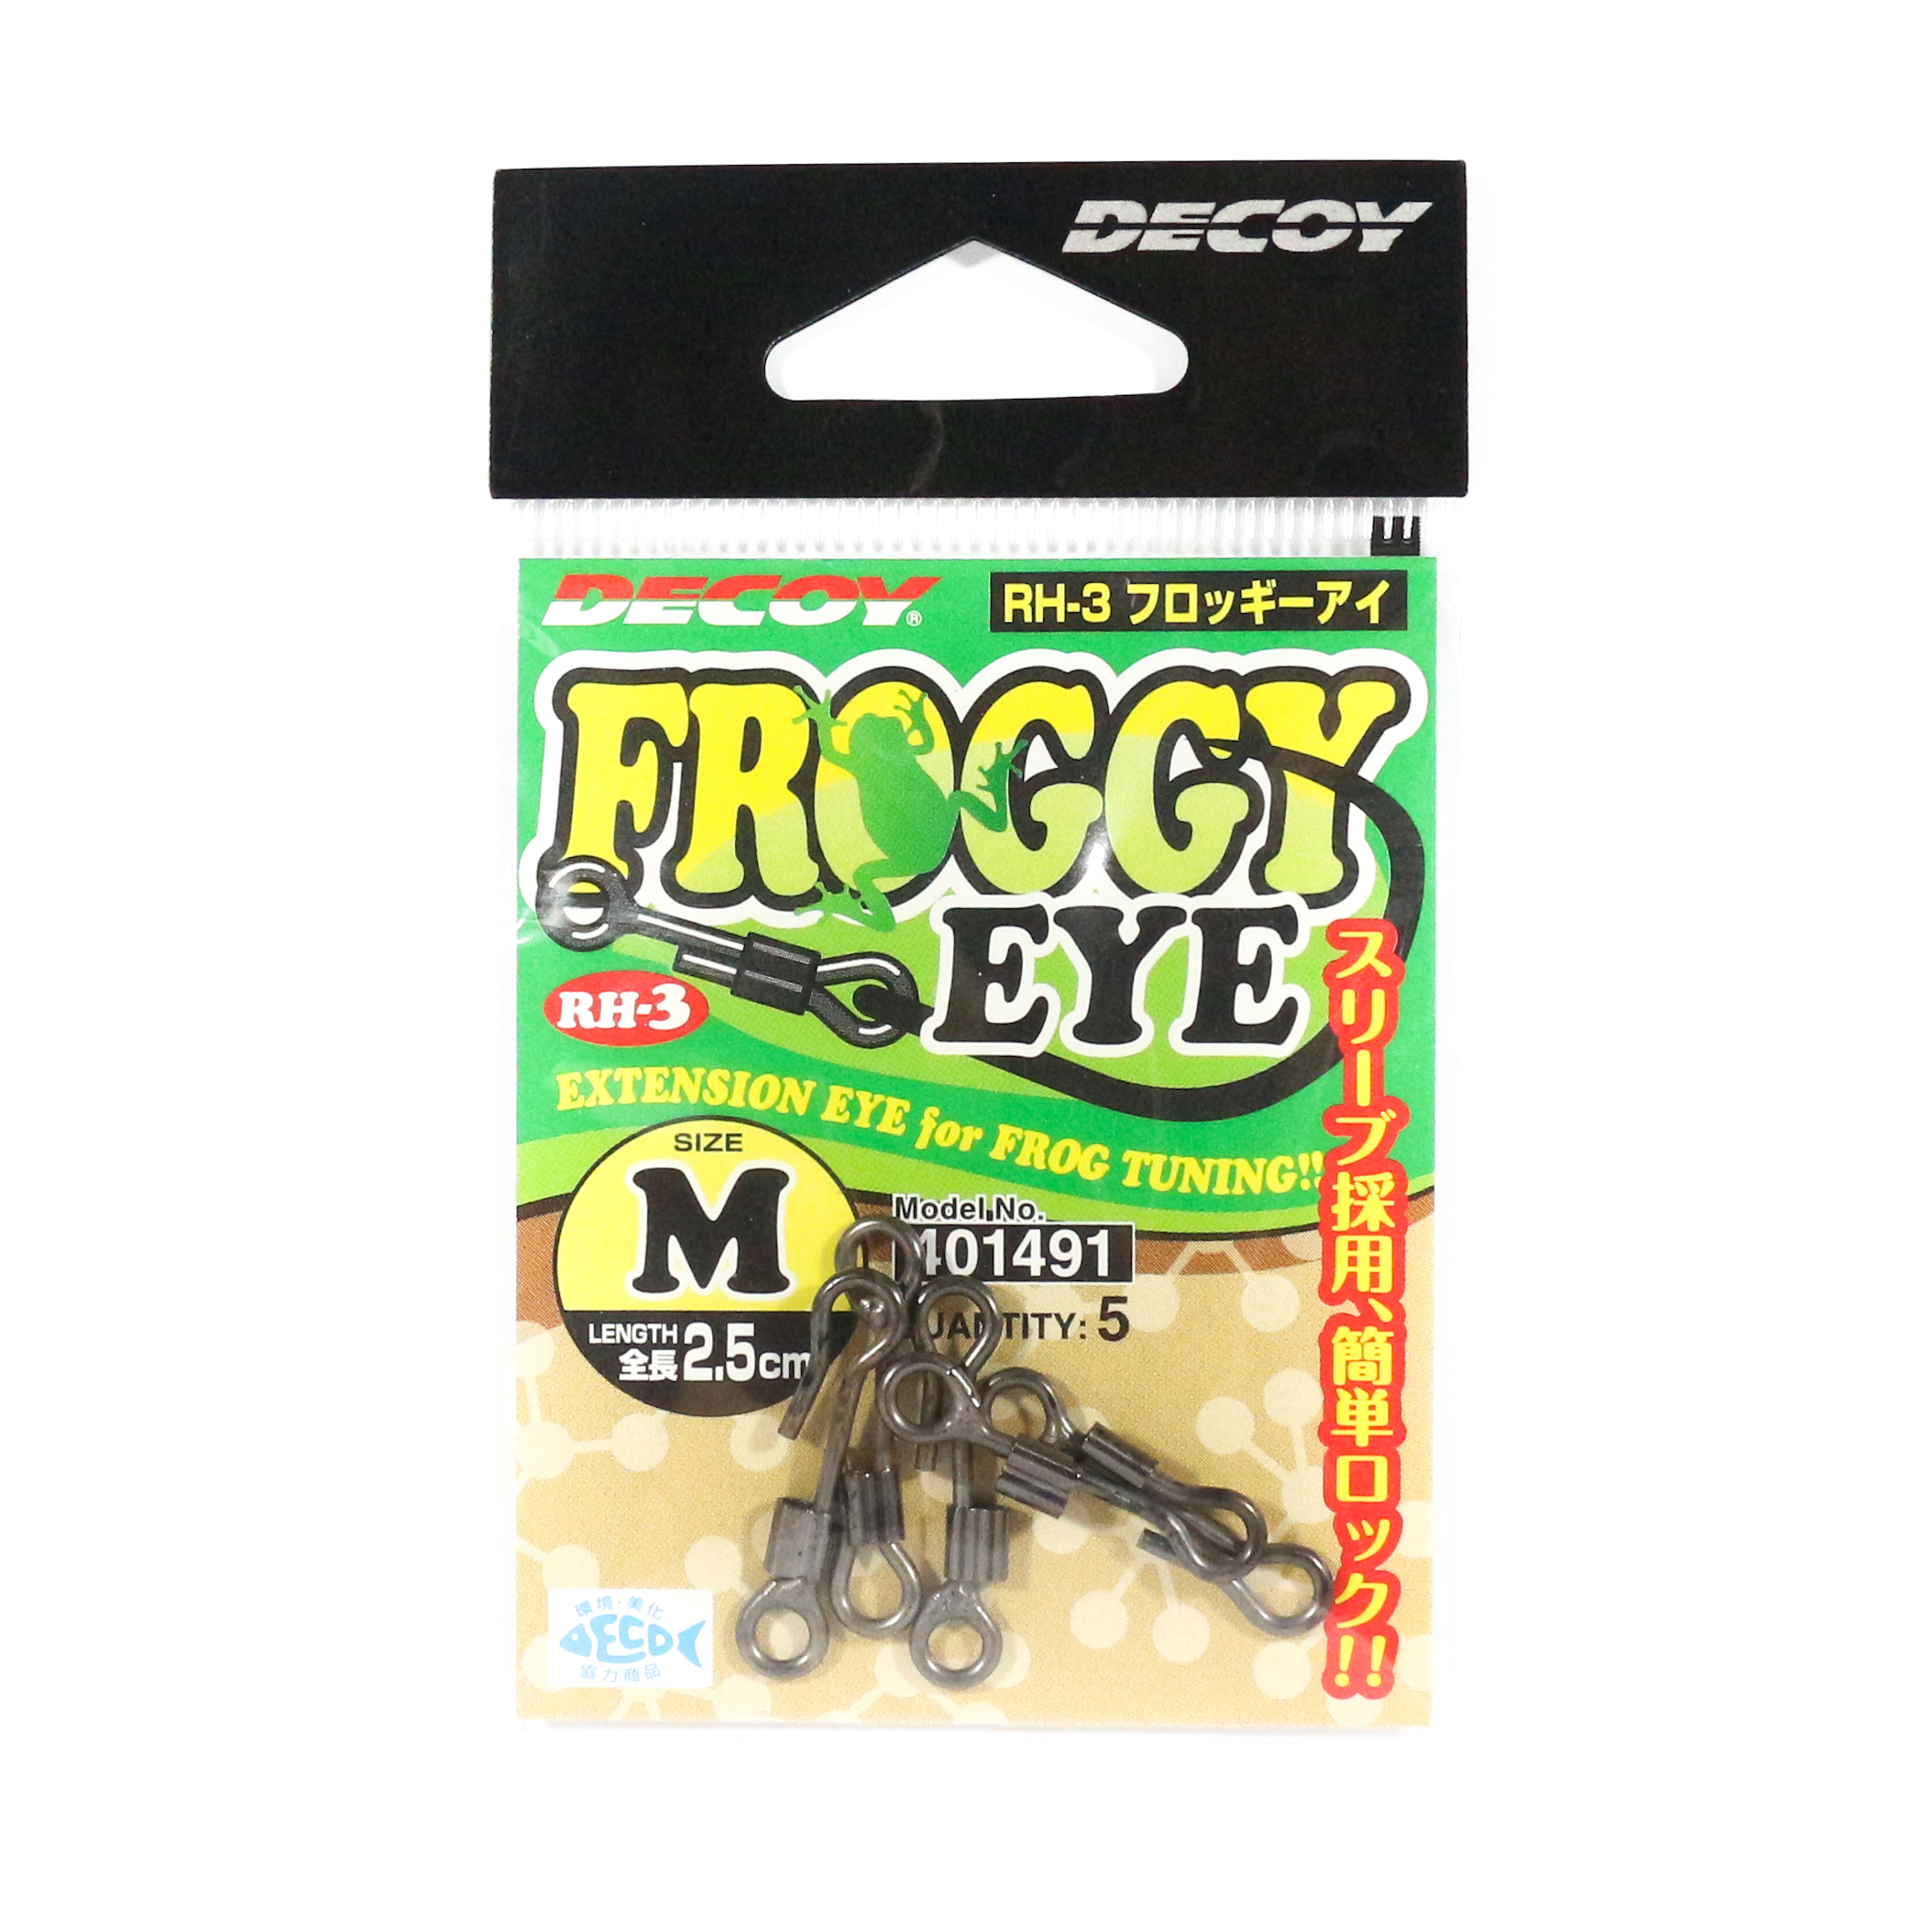 Decoy RH-3 Froggy Eye Extension Eye with Sleeve Size M (1491)